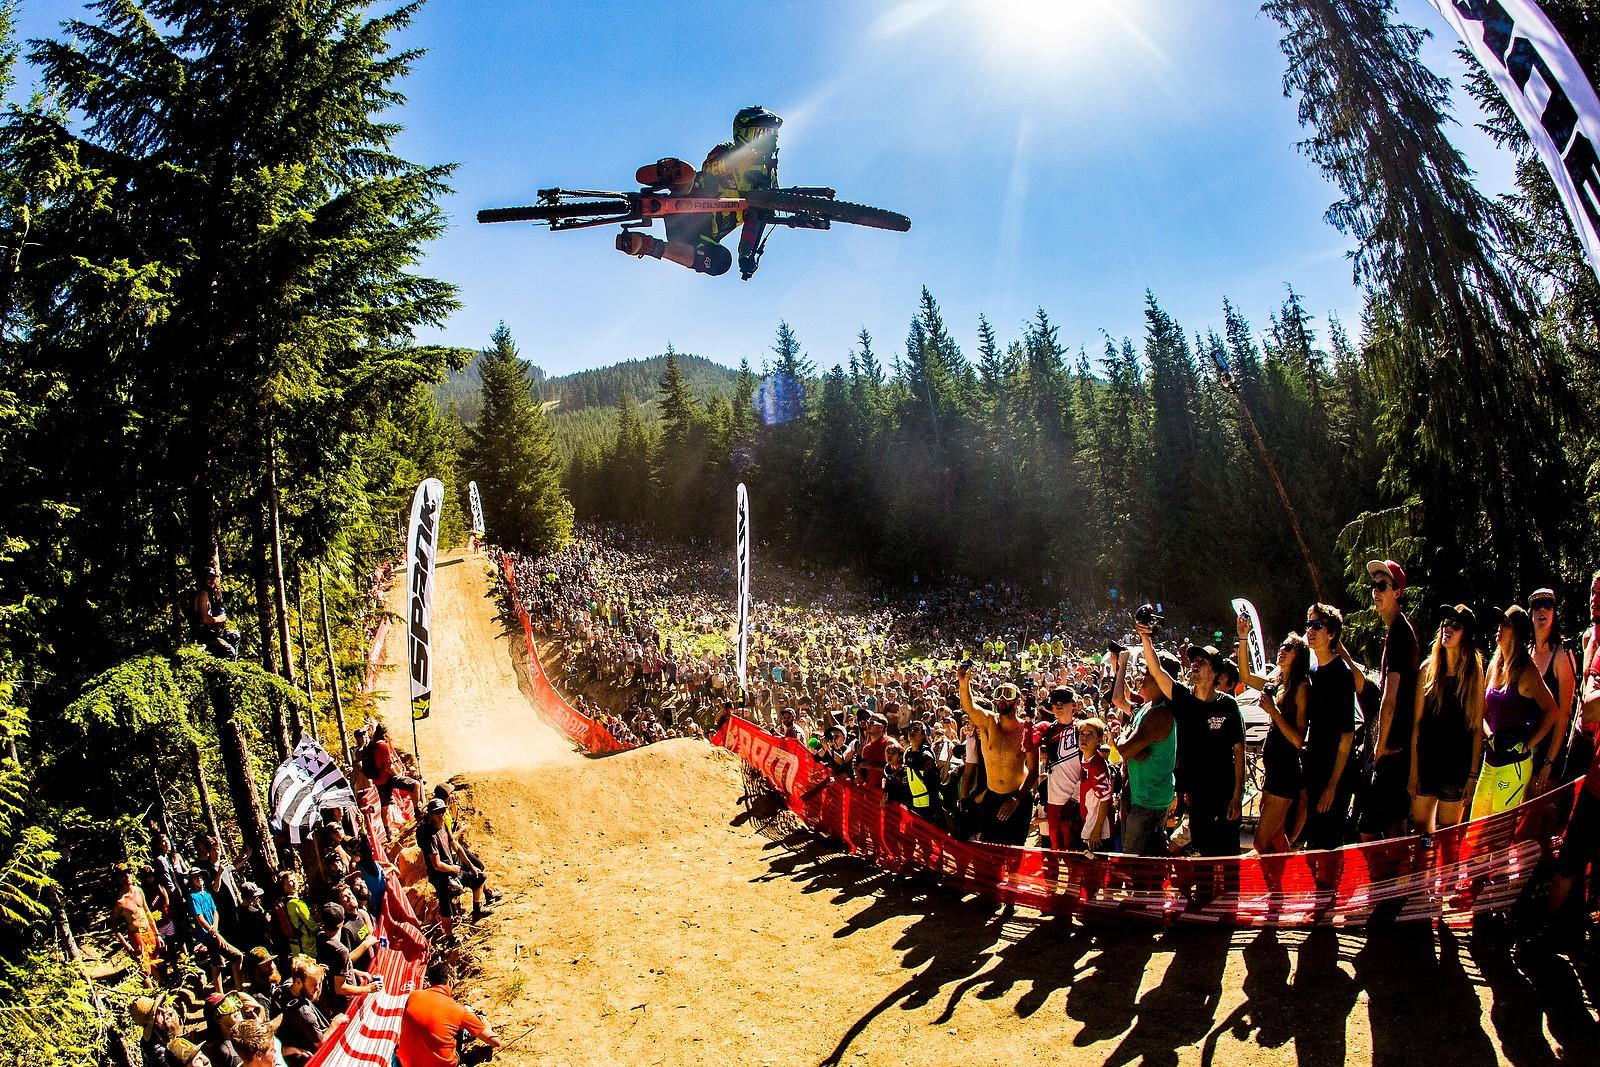 Sam Reynolds - Whip Off World Champs Photo Blast - Mountain Biking Pictures - Vital MTB